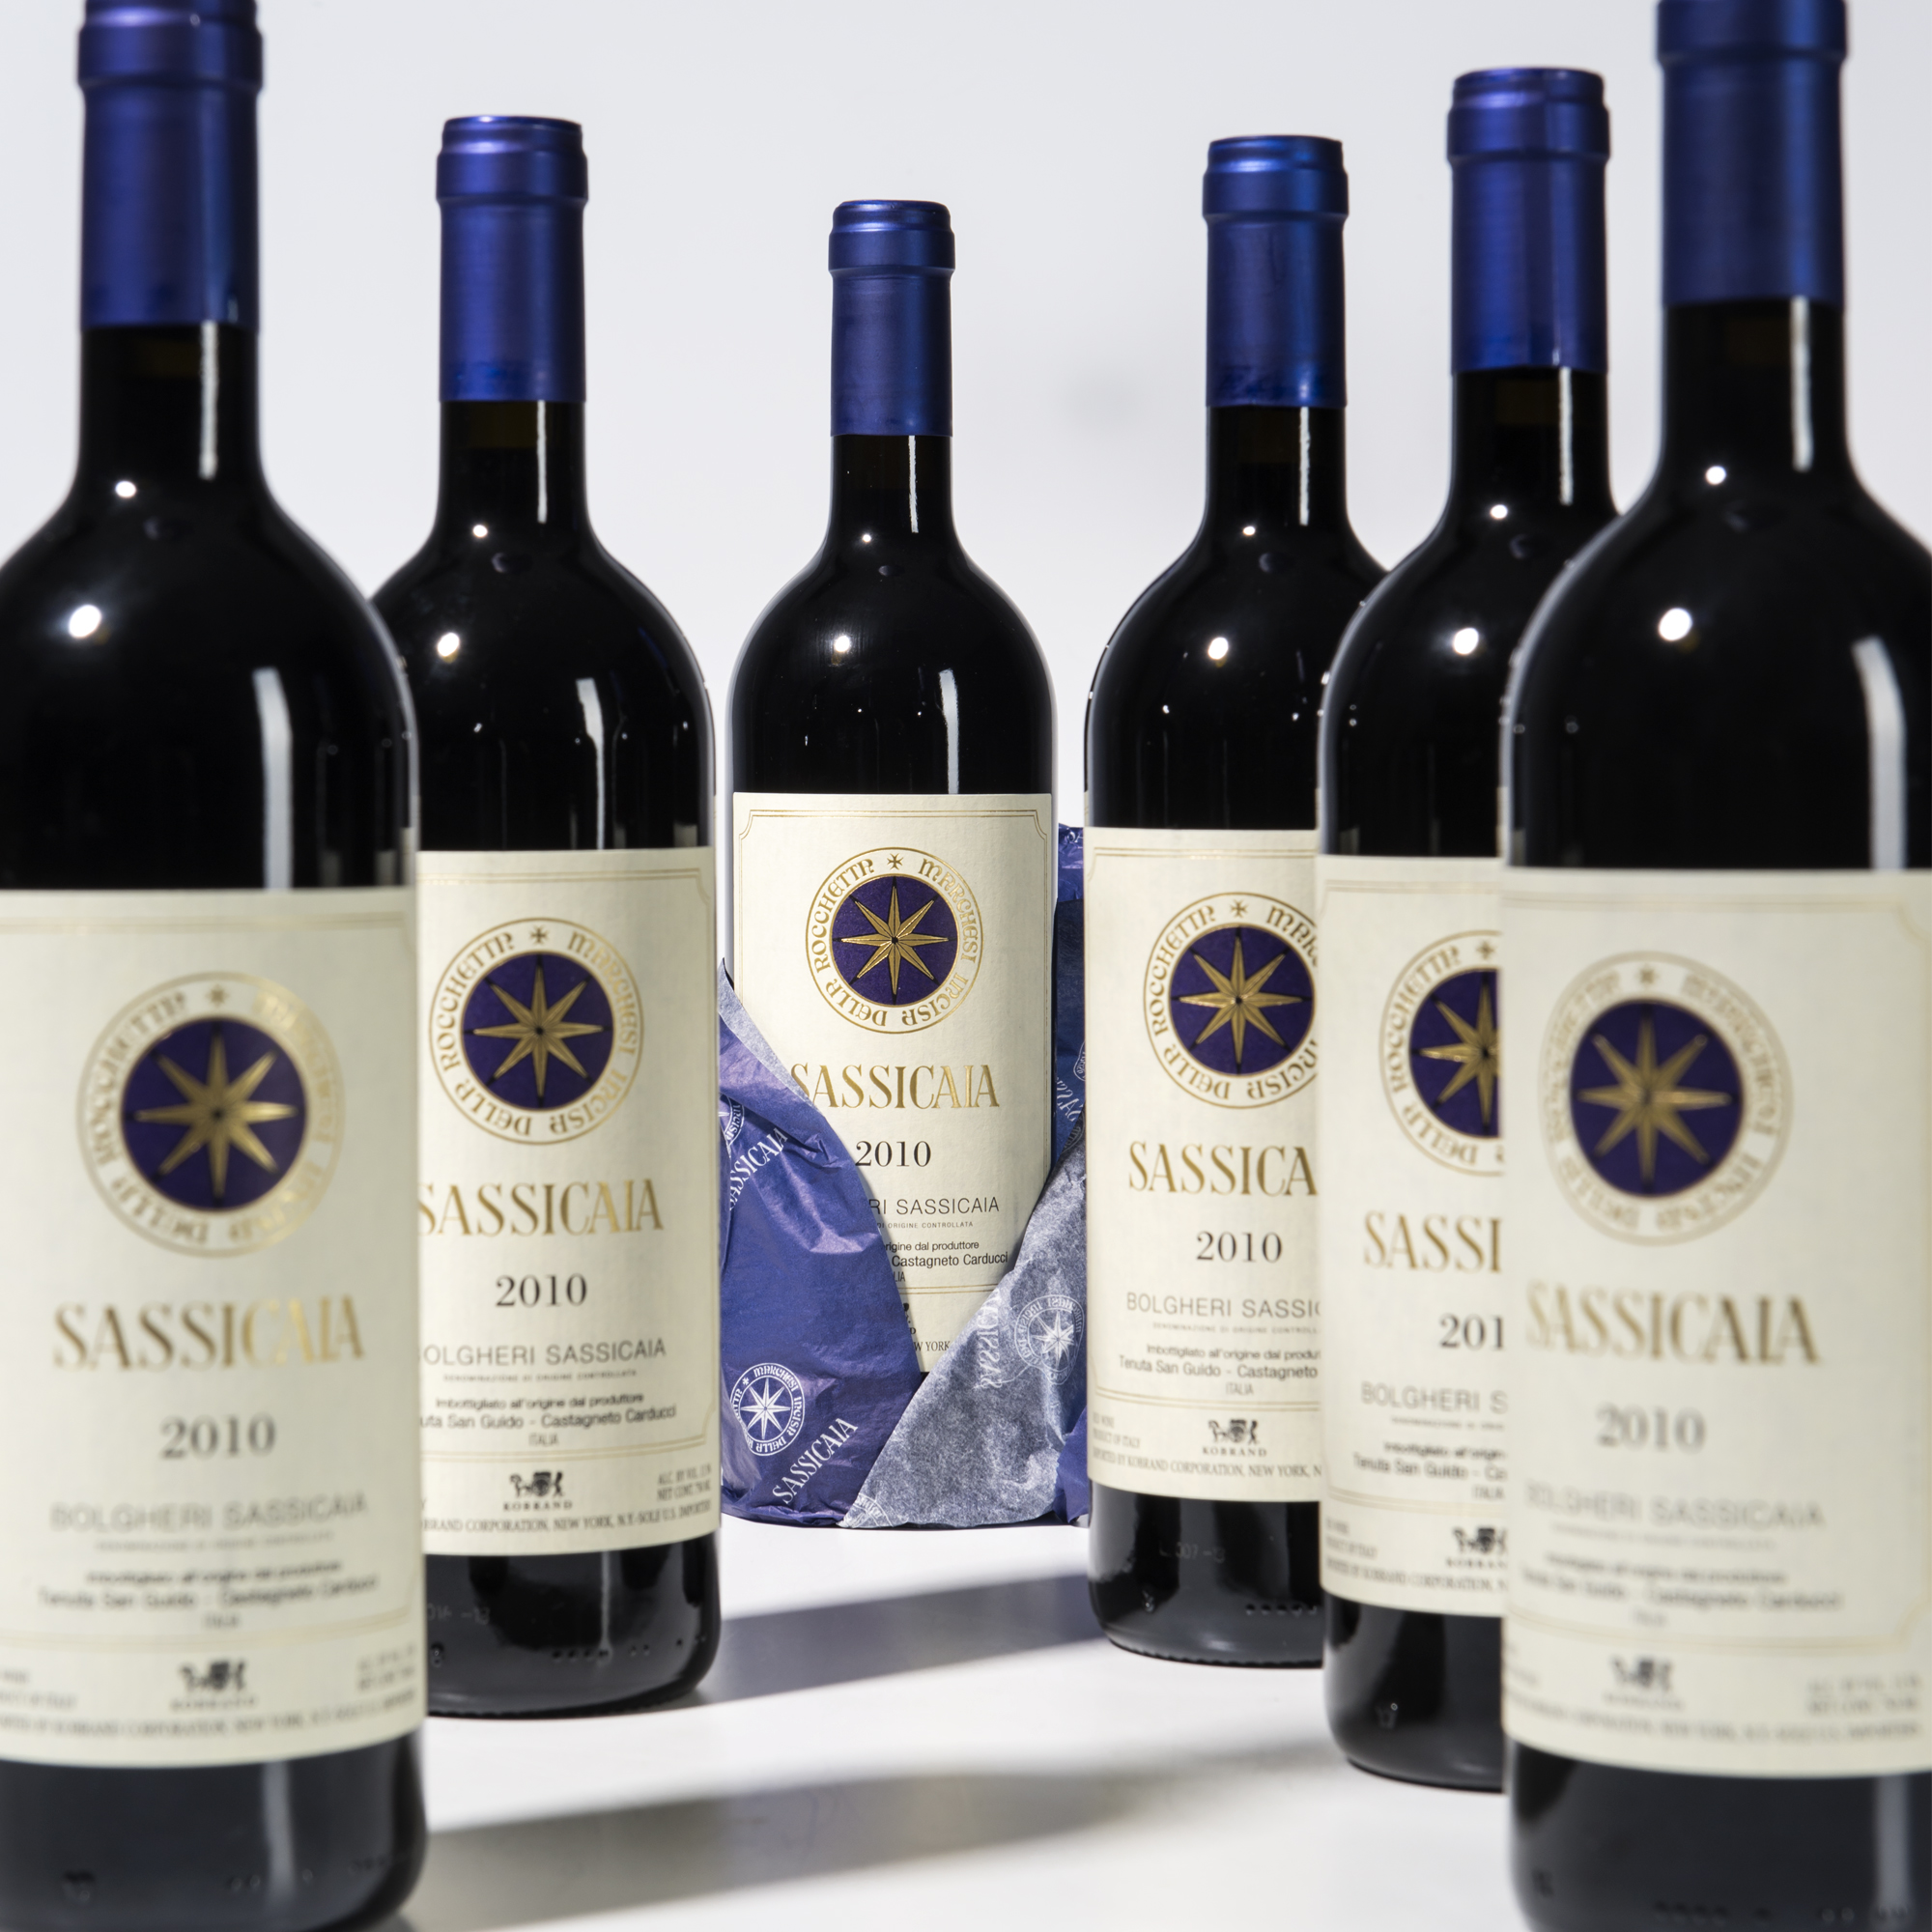 Tenuta San Guido Sassicaia 2010, 6 bottles